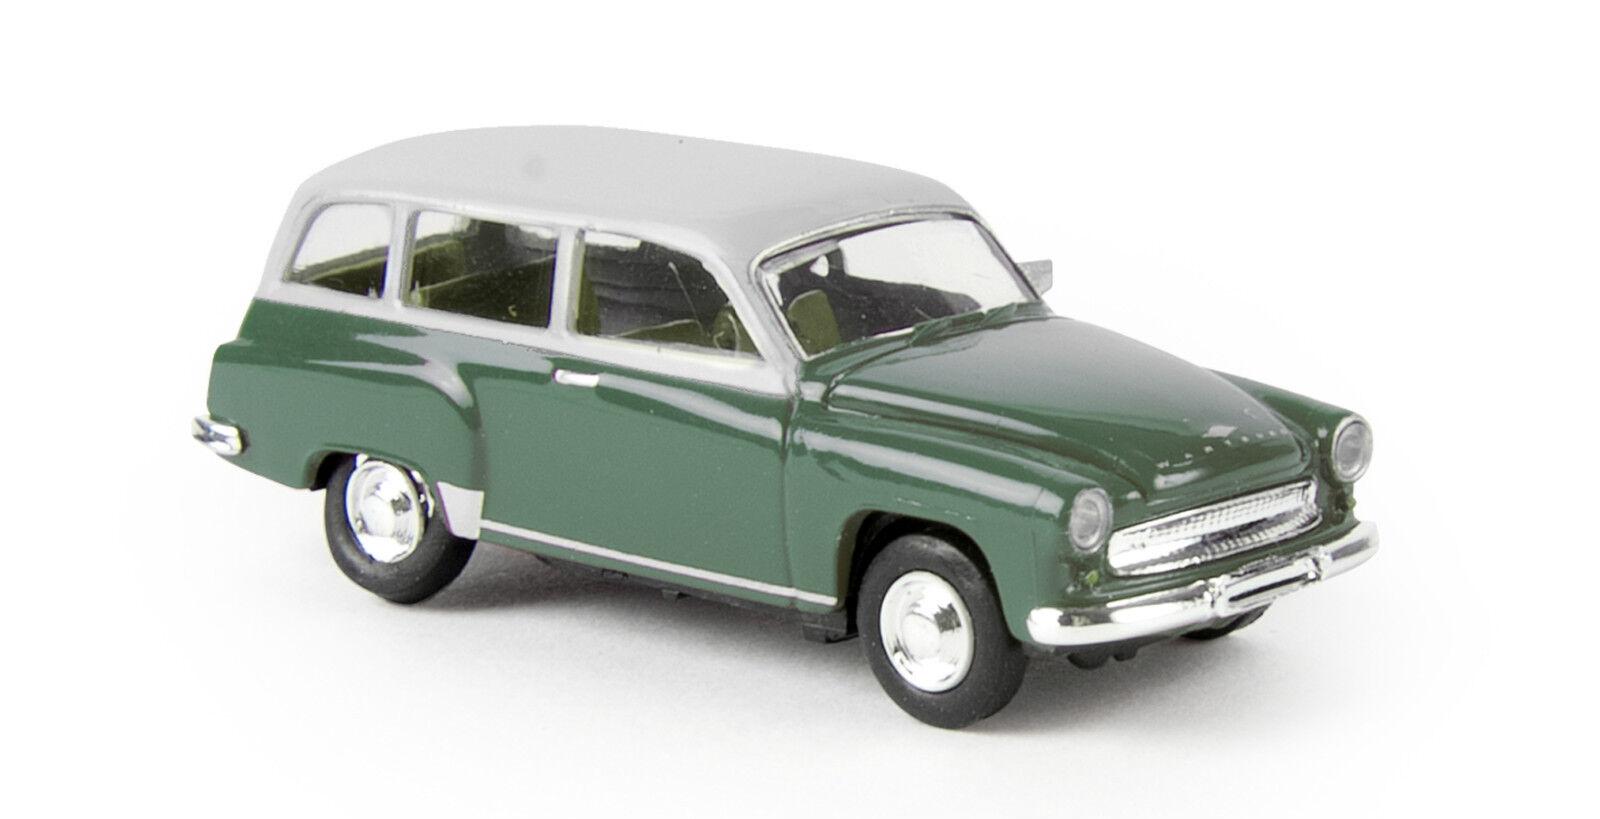 Wartburg 311 Kombi, green grey, Brekina  H0 DDR Auto Fertigmodell 1 87, 27172